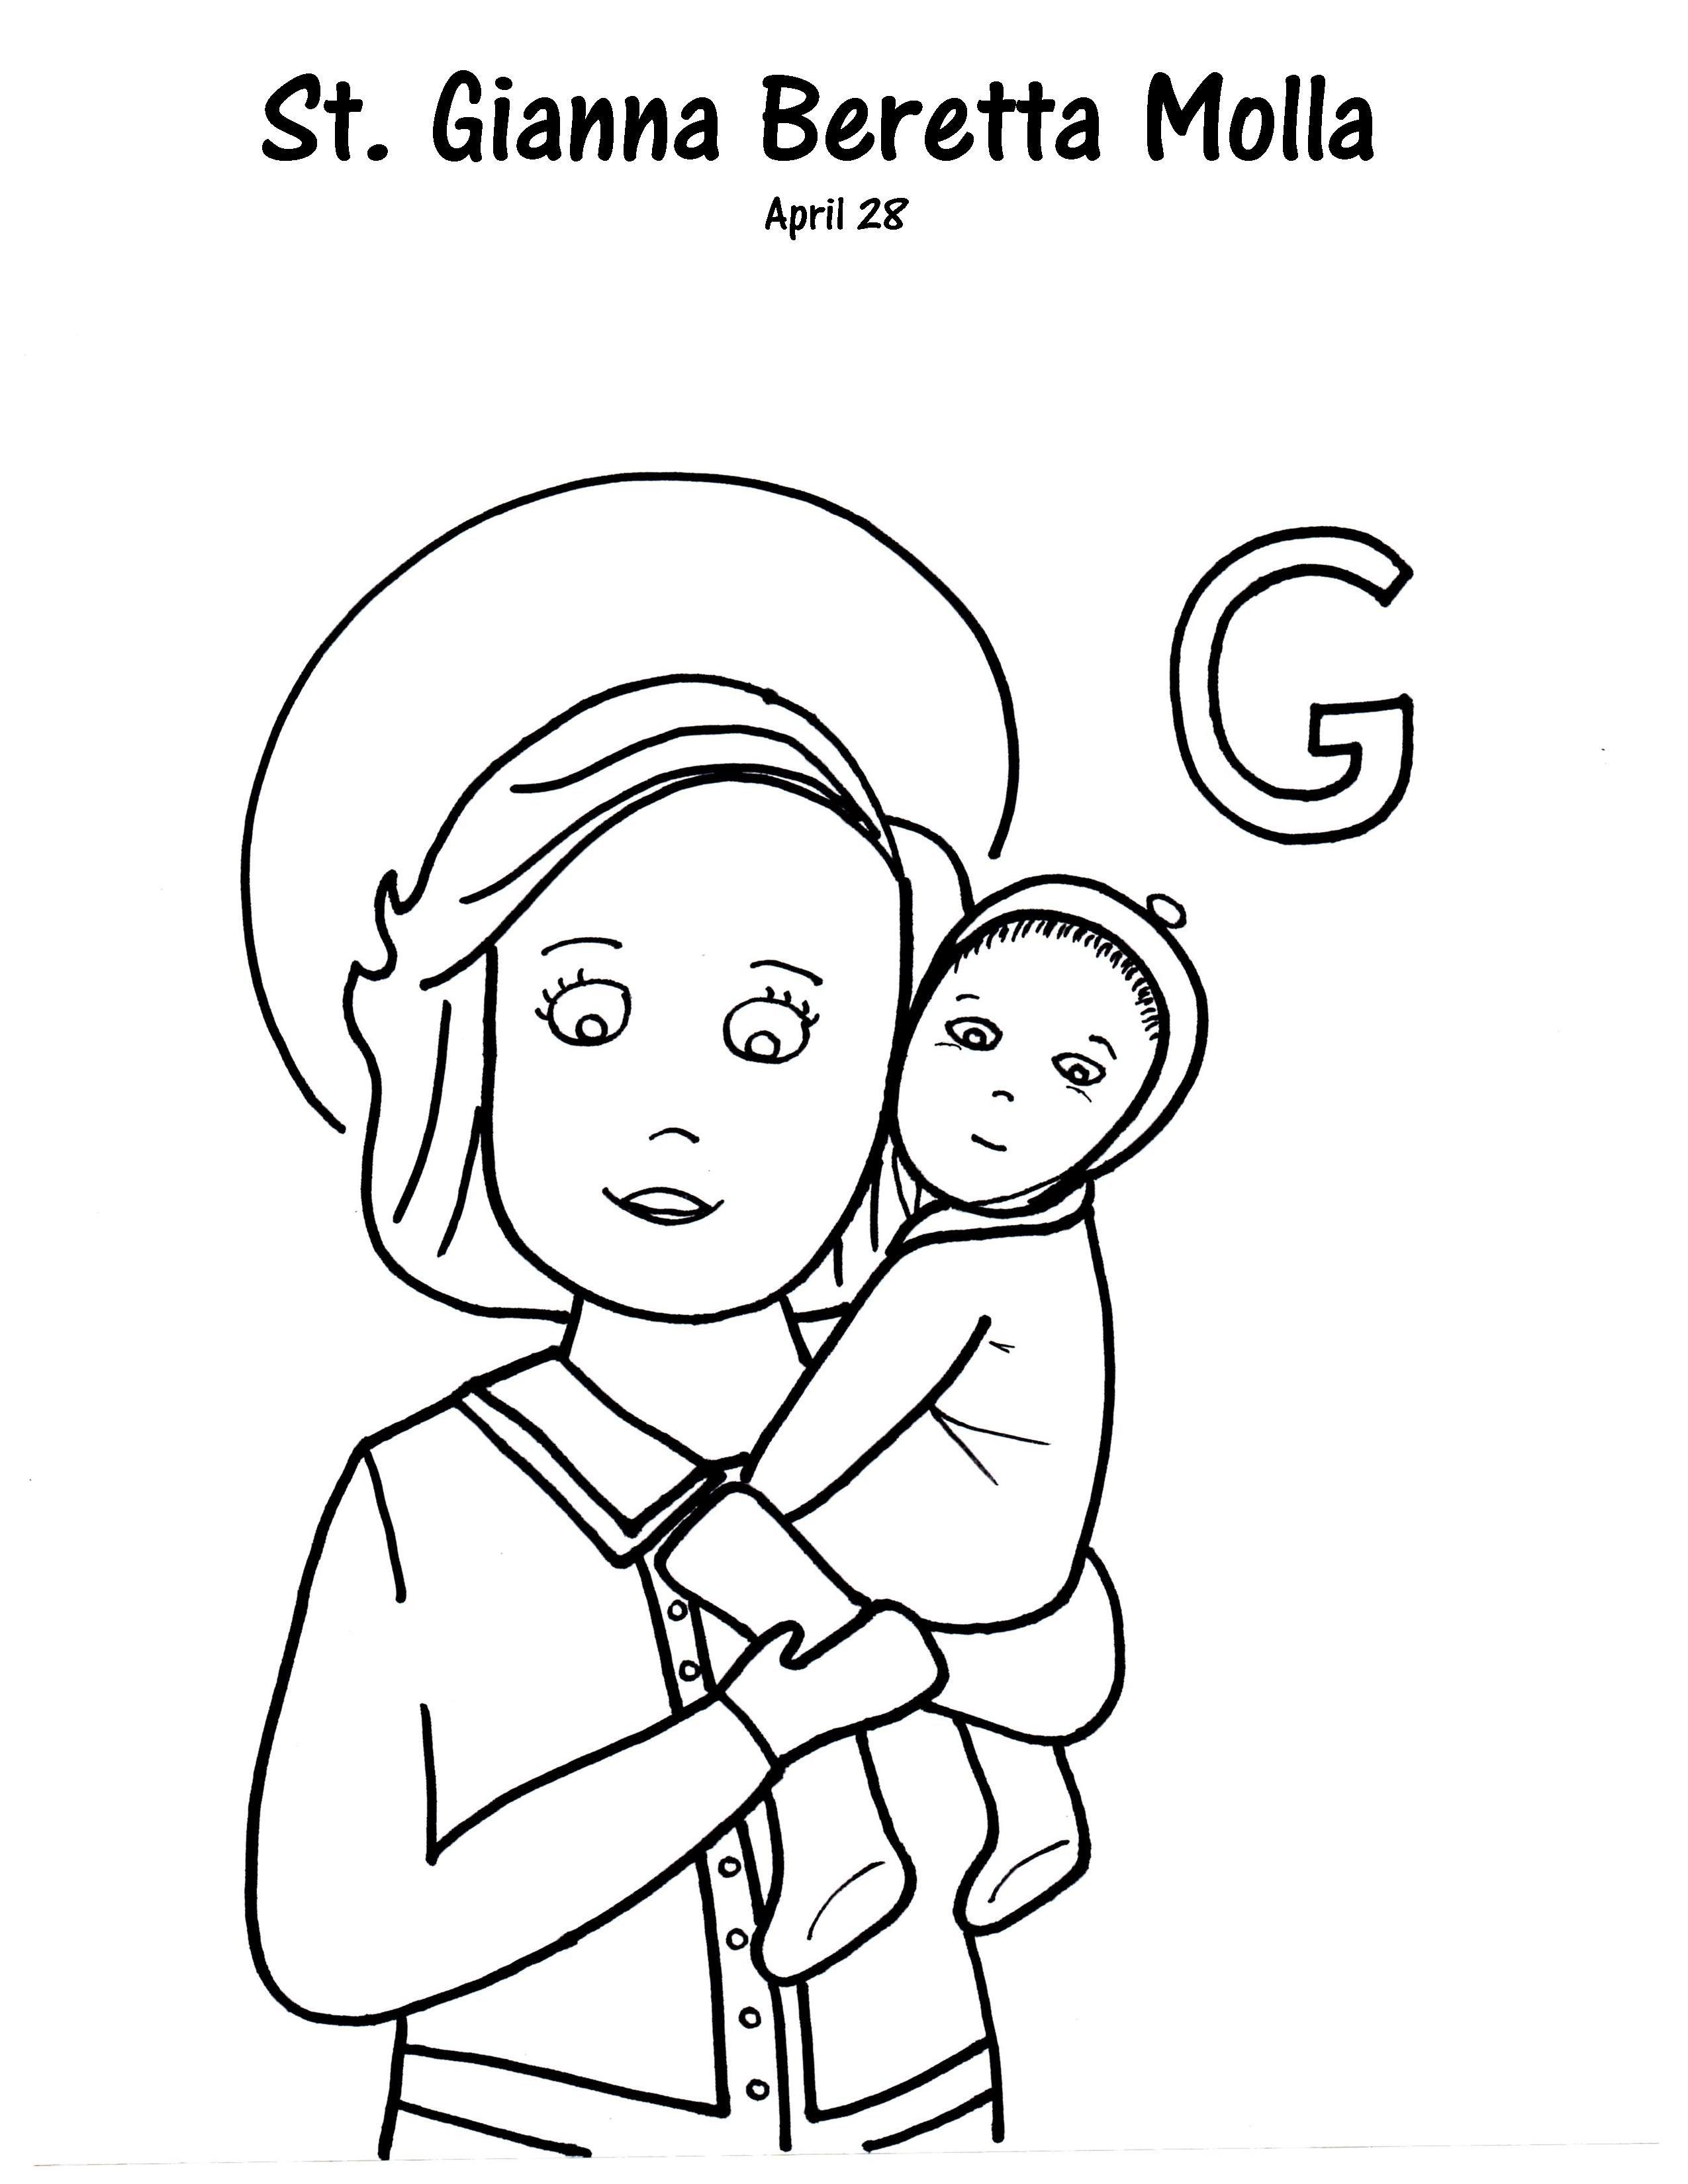 G Is For St Gianna Beretta Molla